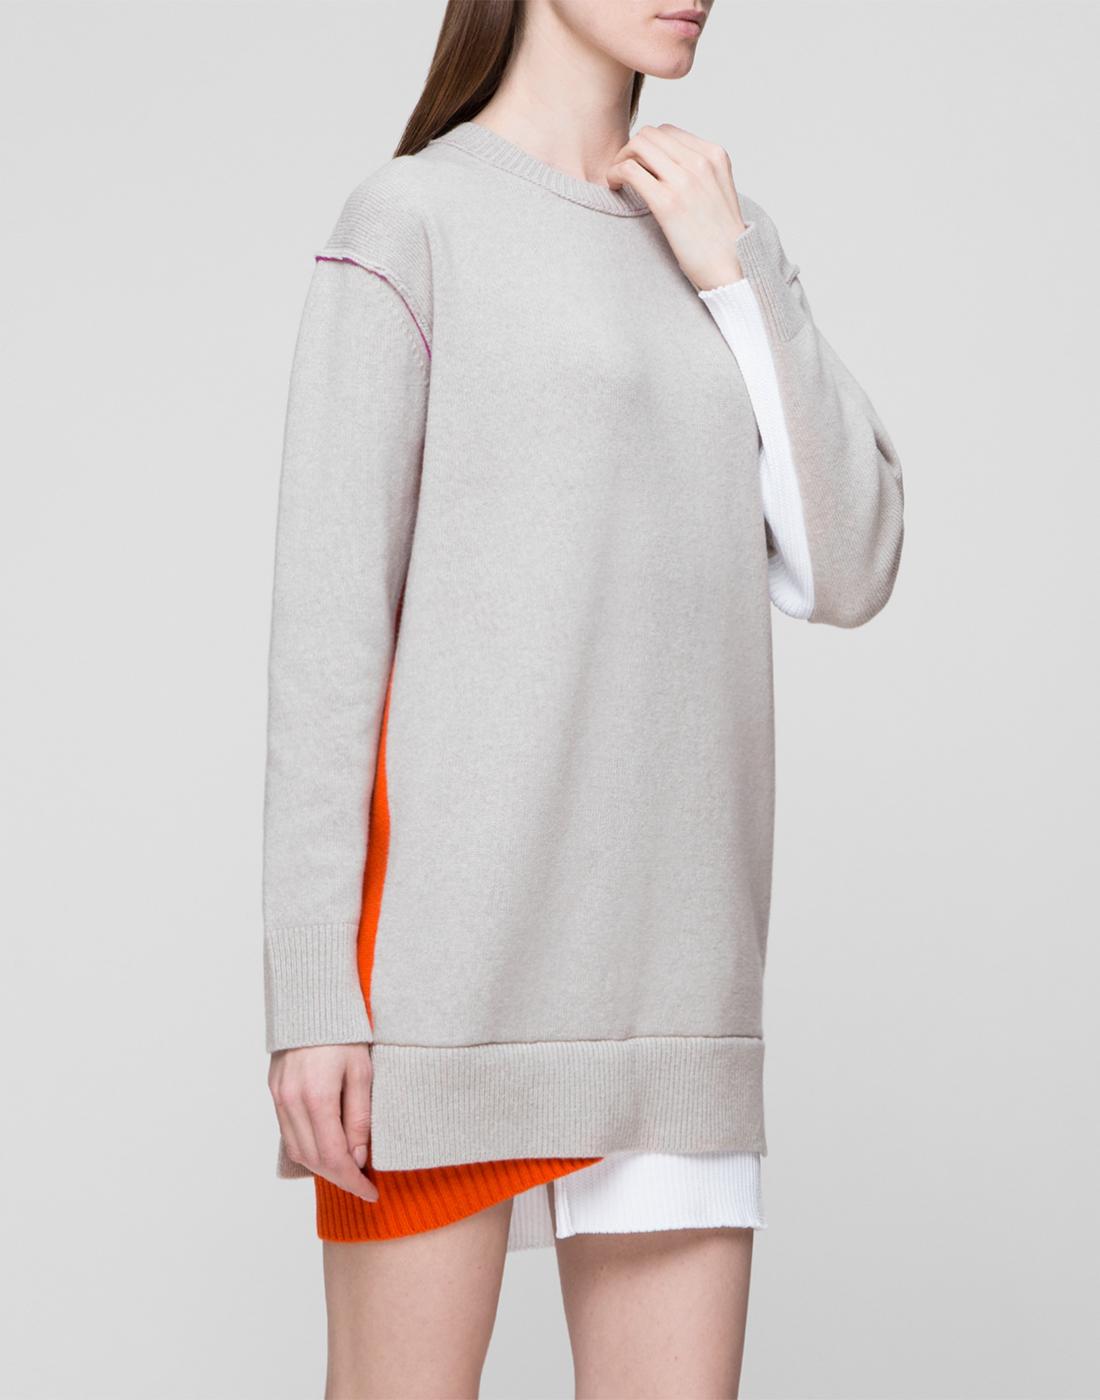 Женское бежевое шерстяное платье Dorothee Schumacher S516304/031-3